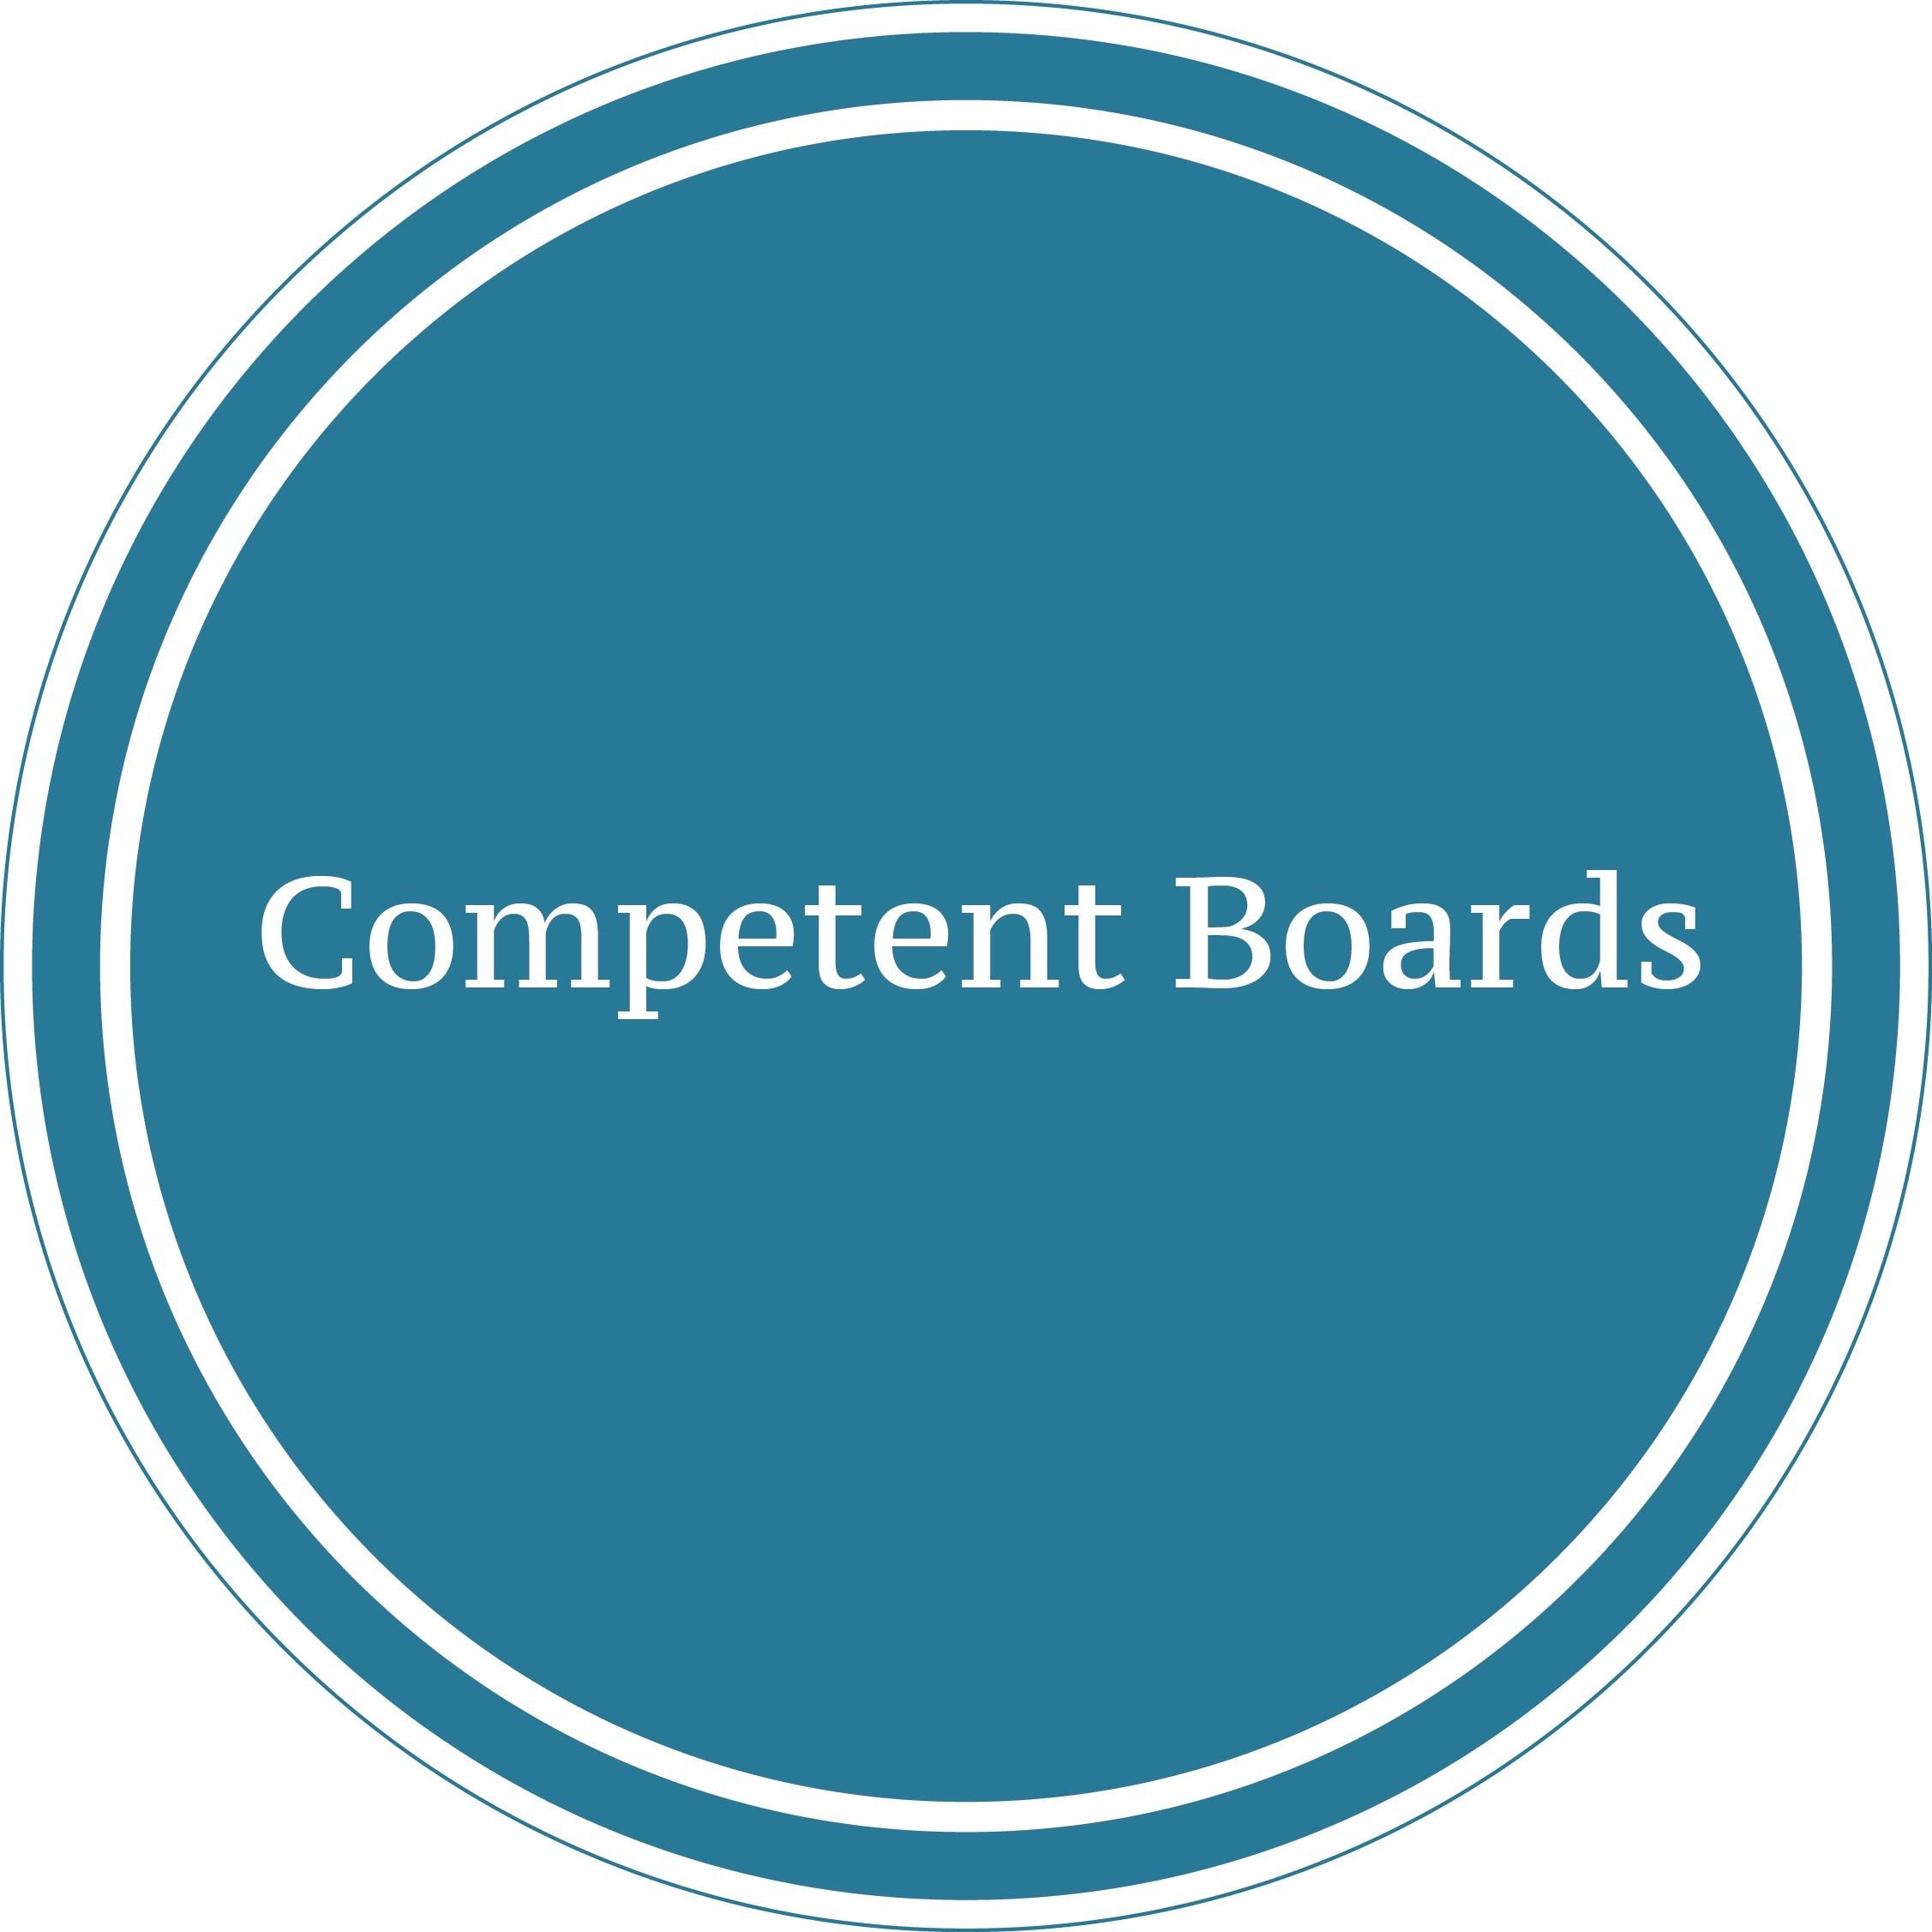 (PRNewsfoto/Competent Boards)